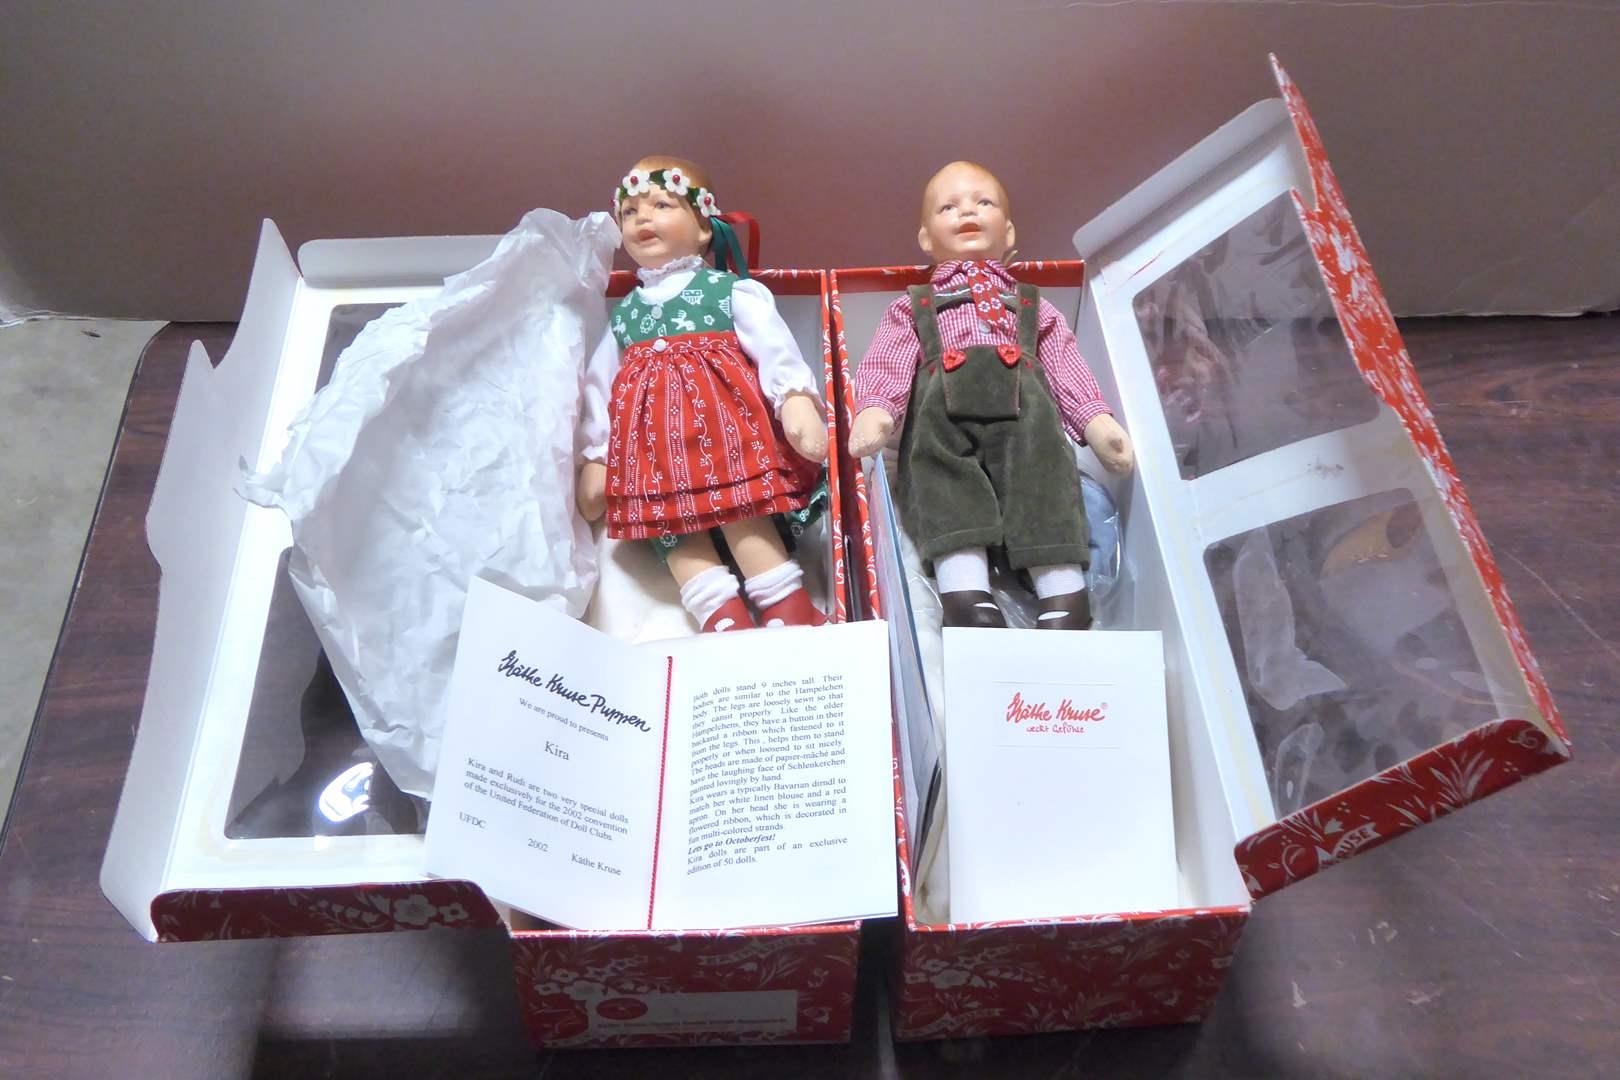 Lot # 113 - Two Kathe Kruse Puppen Dolls (Kira & Rudy) W/Boxes  (main image)